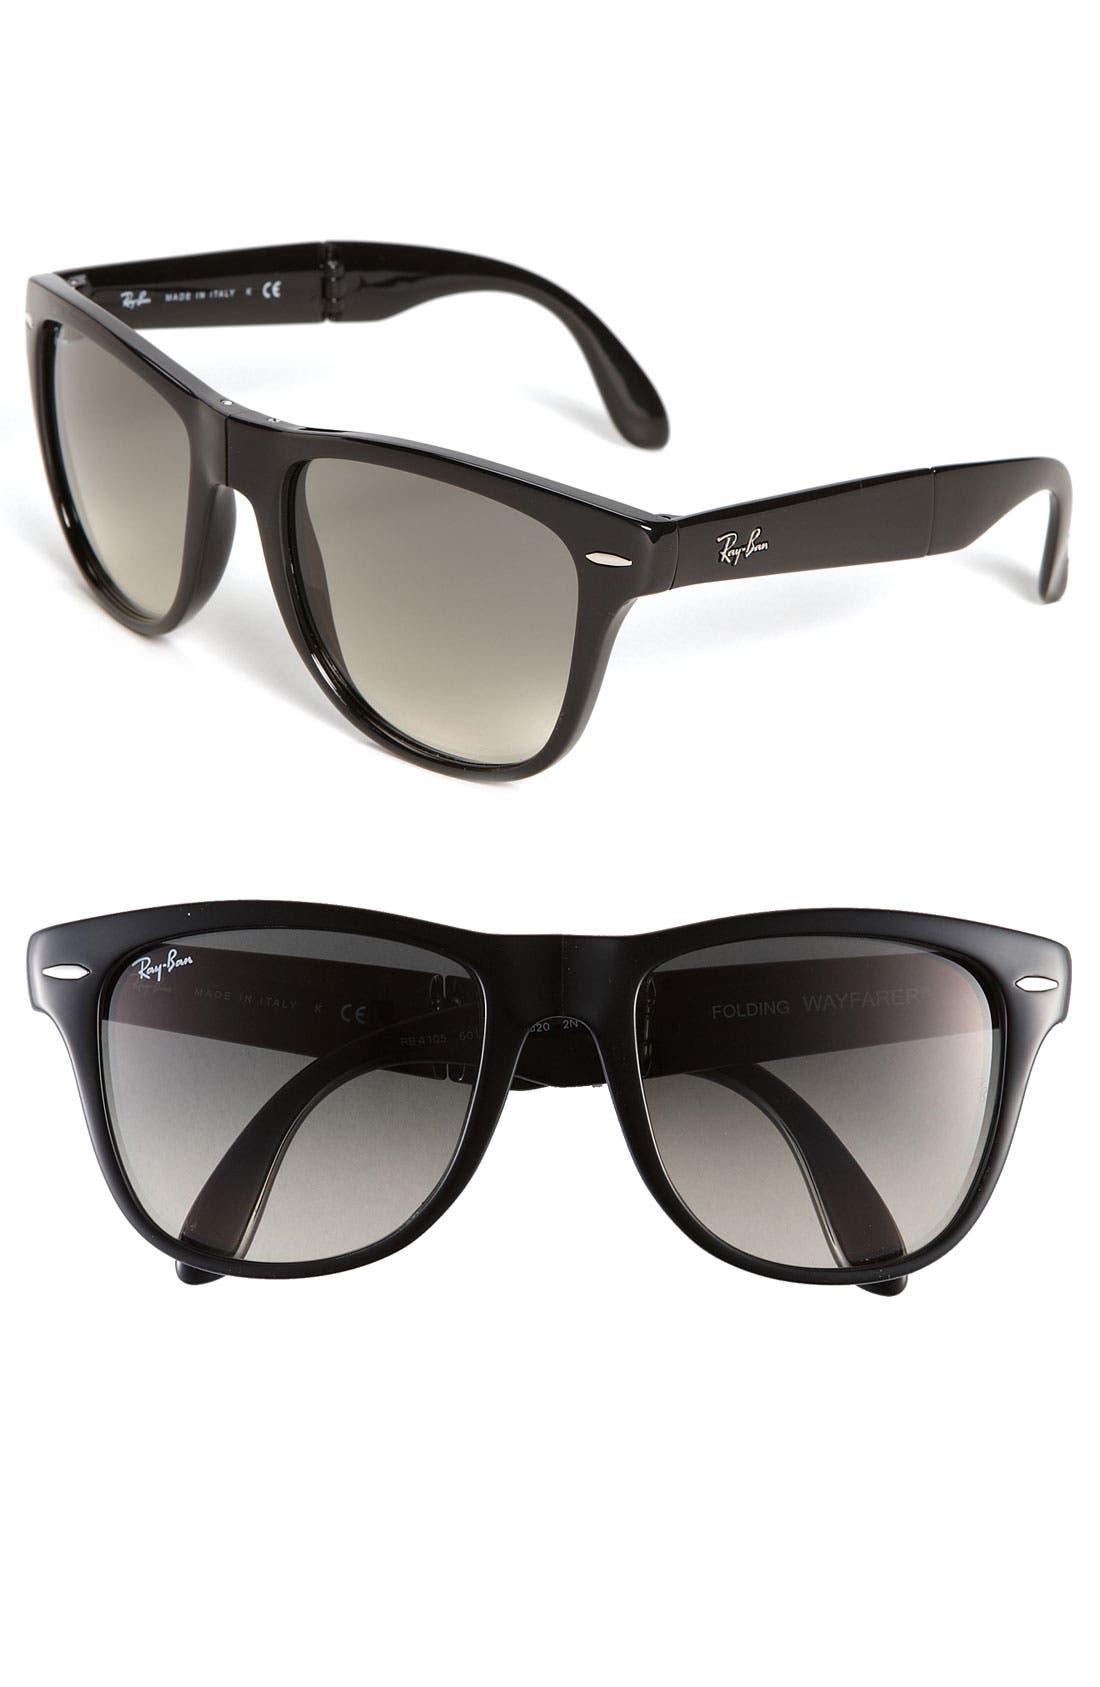 Alternate Image 1 Selected - Ray-Ban 'Folding Wayfarer' 54mm Sunglasses